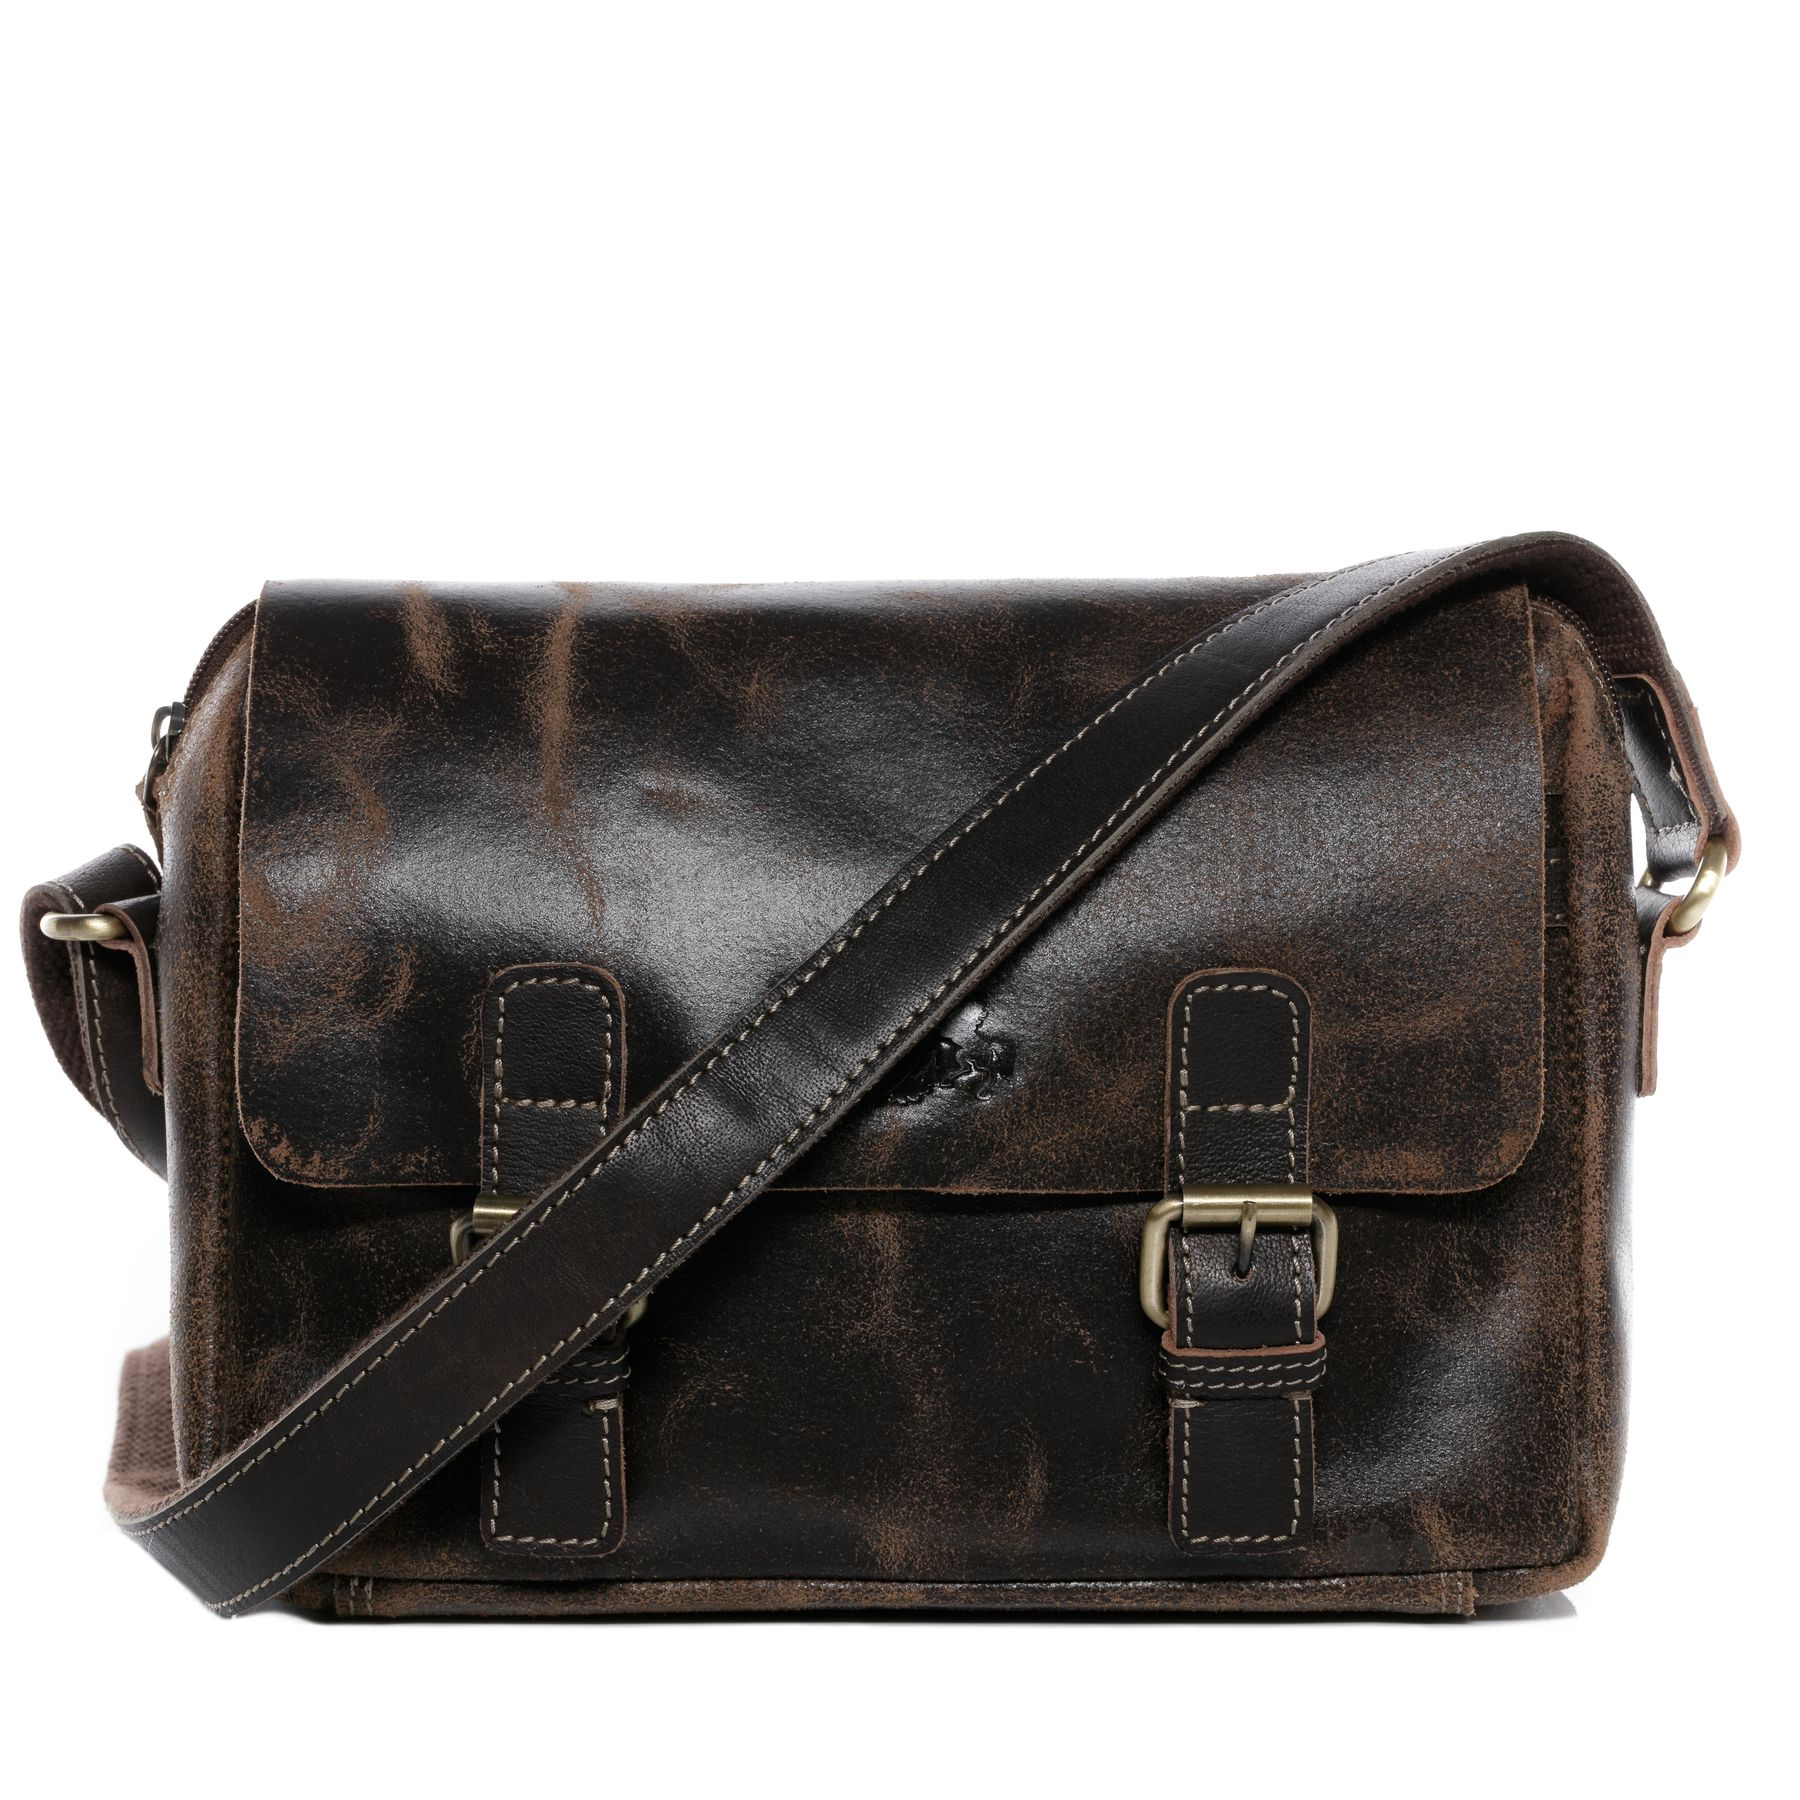 sid vain messenger bag distressed leather yale brown contrastdark shoulder bag cross body bag leather bags laptop bags travel bags suitcases mybagfactory